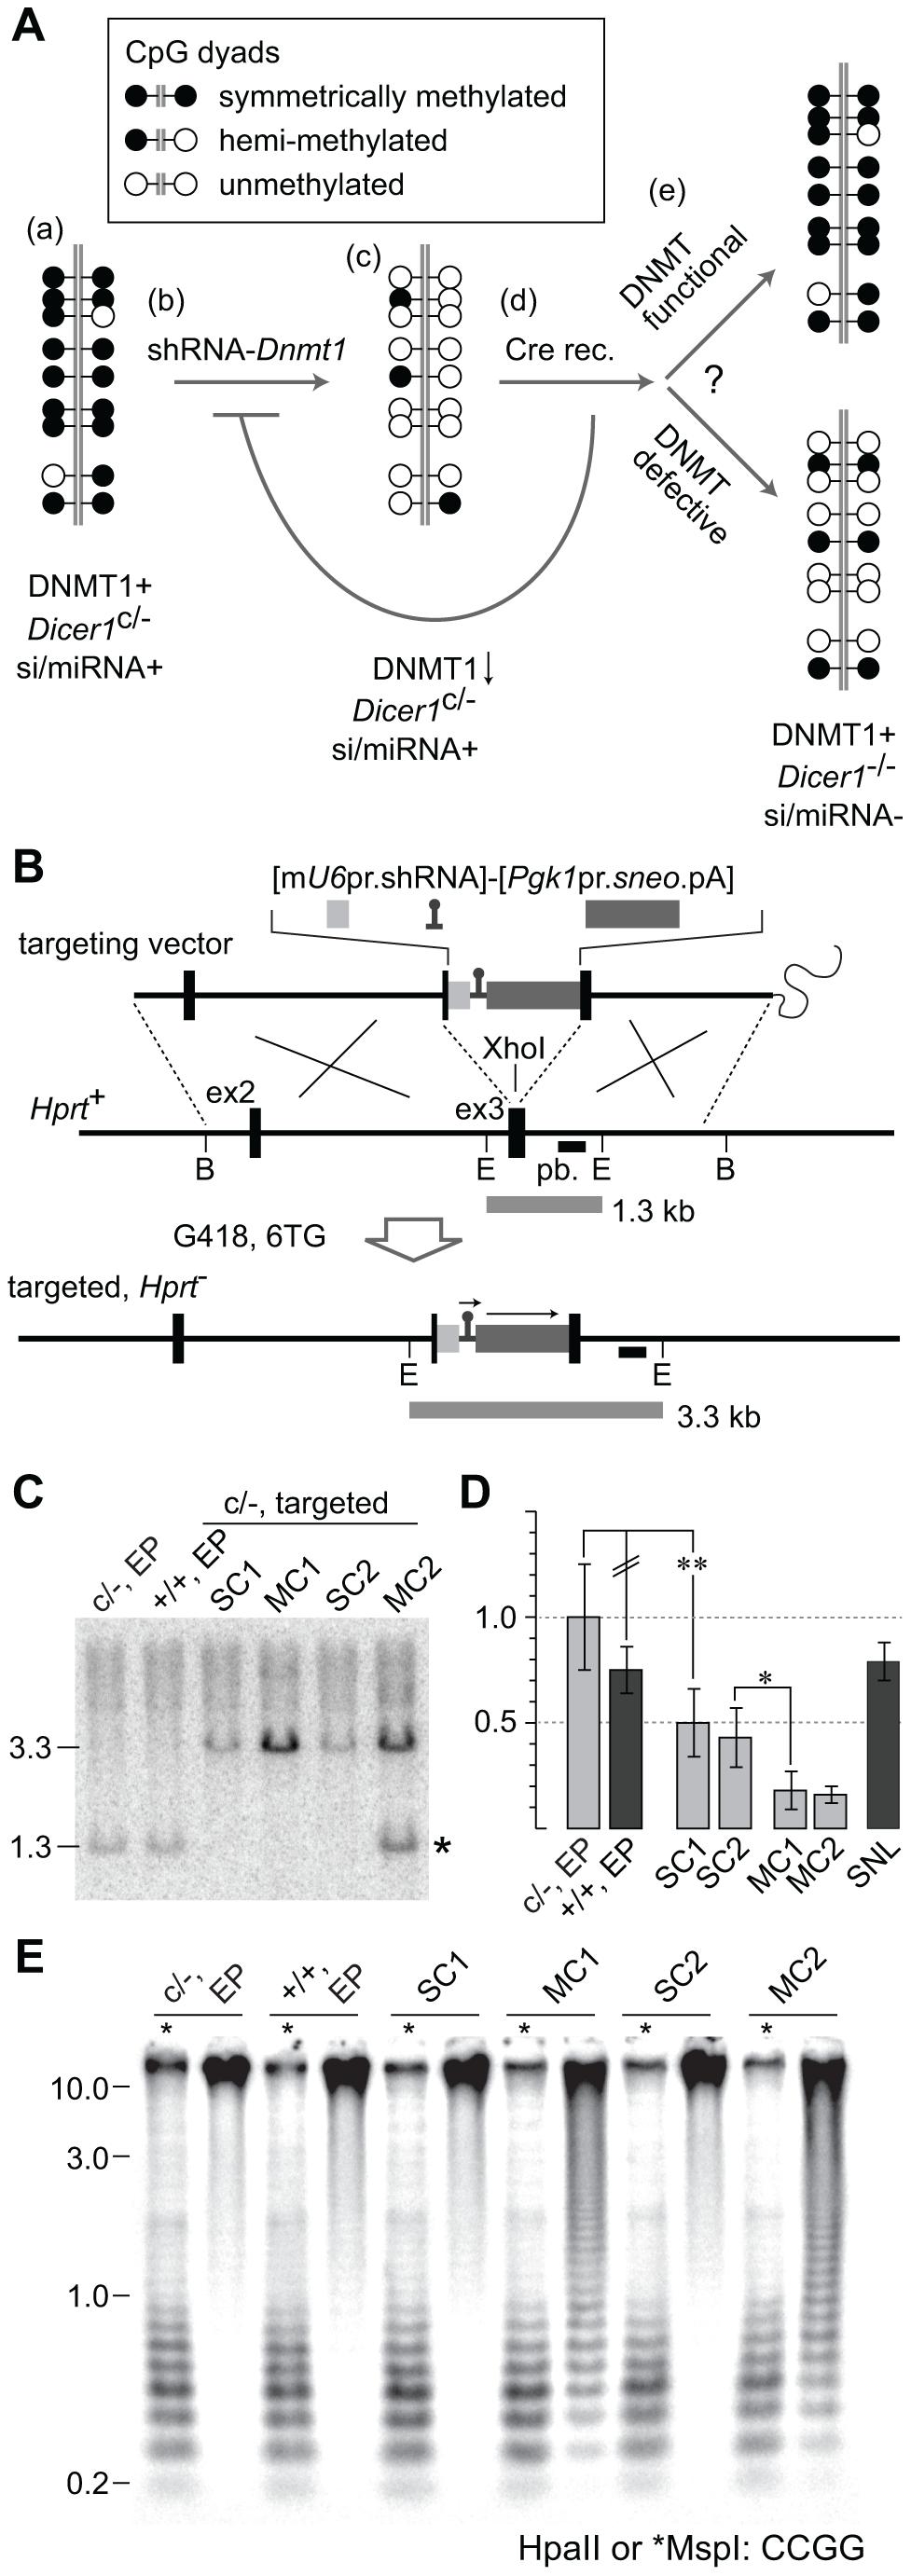 Experimental strategy to test rebound DNA methylation after <i>Dicer1</i> ablation.